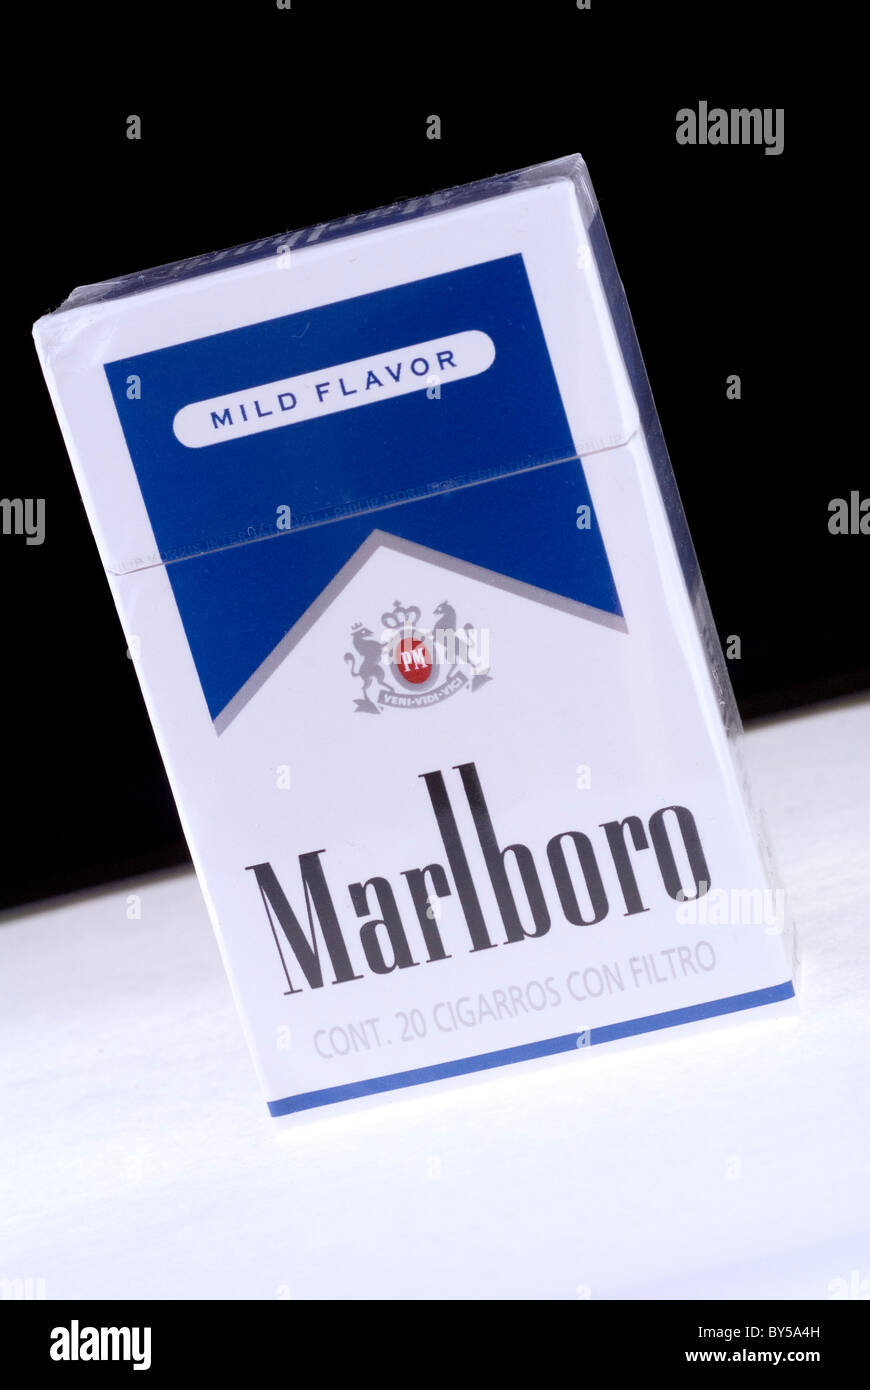 Buy American made Marlboro cigarettes online